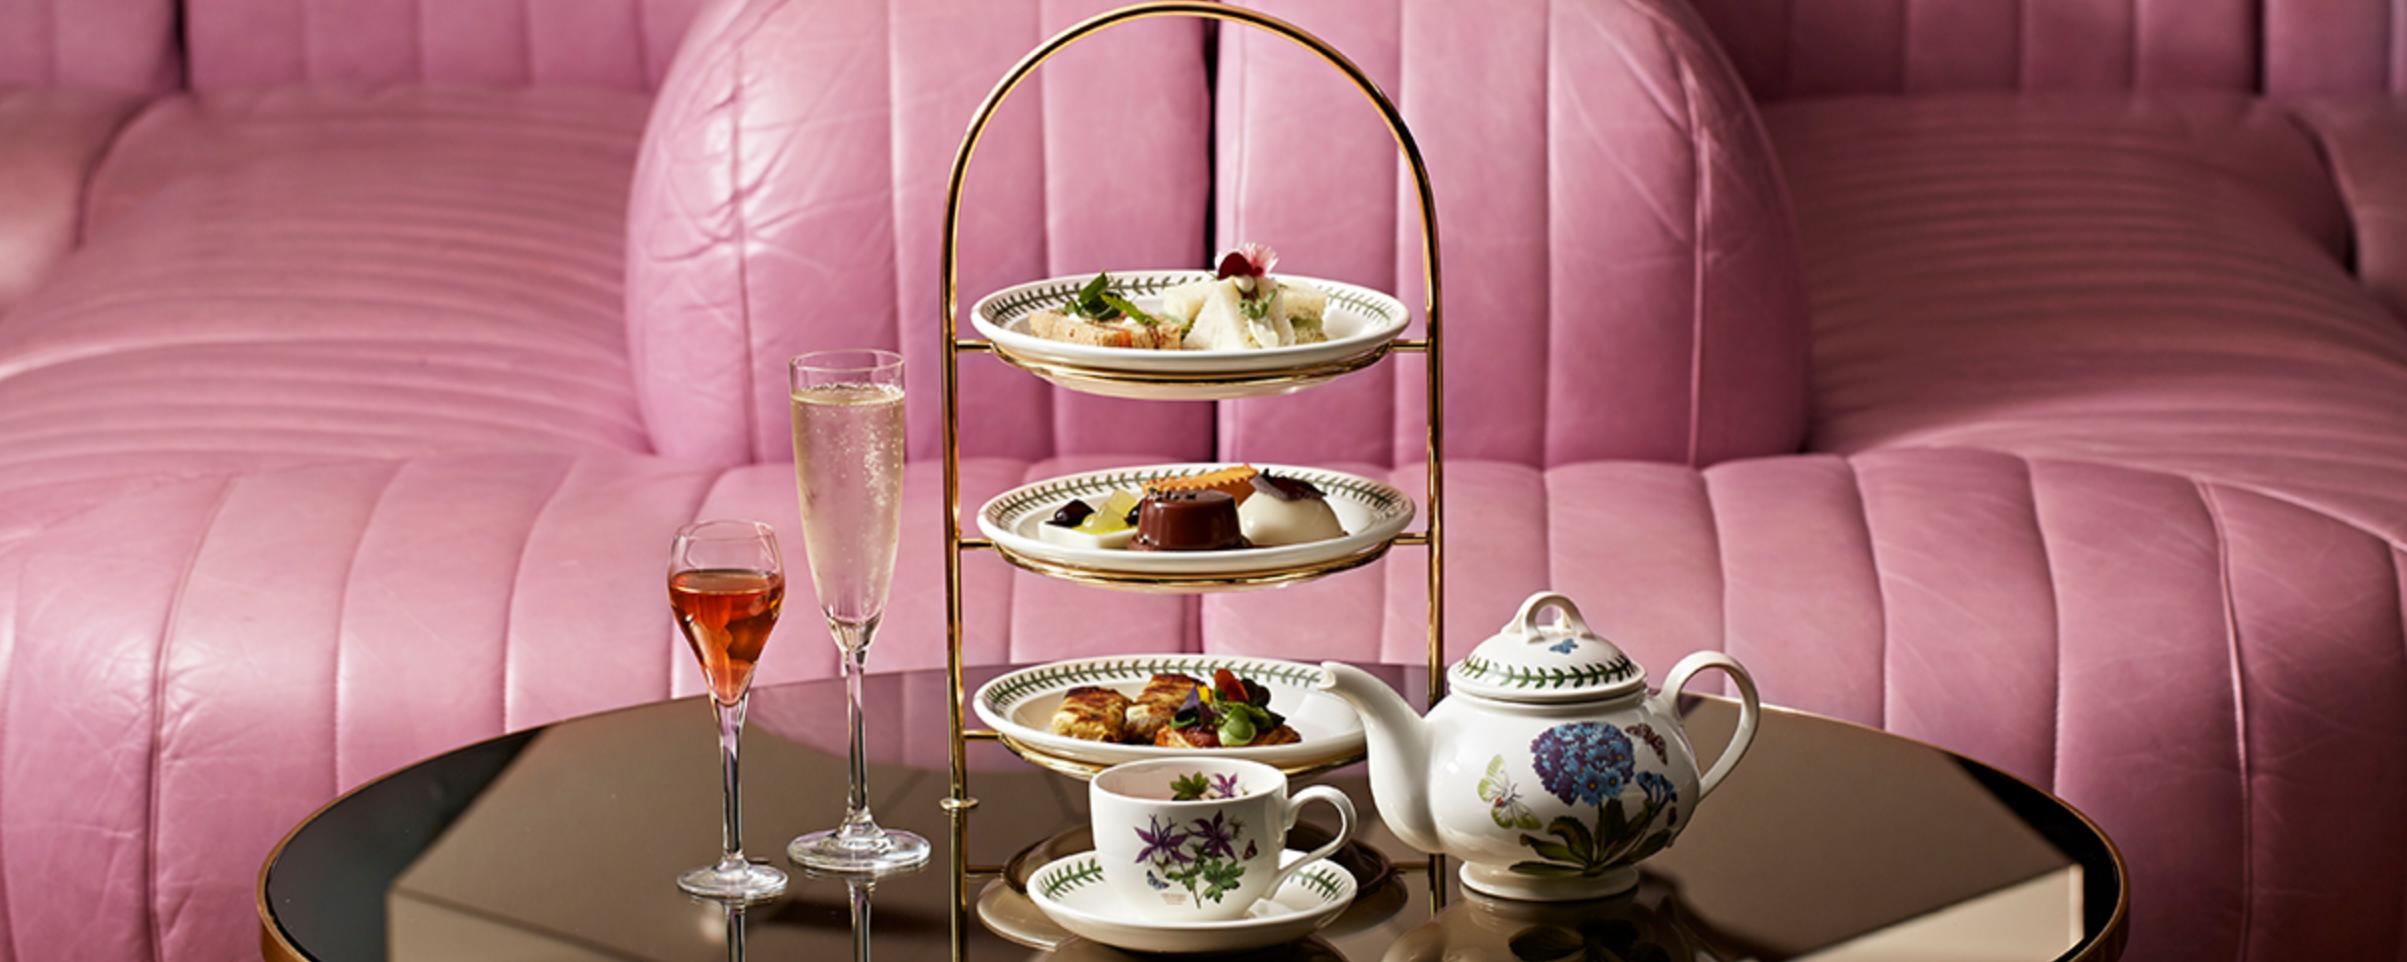 Afternoon tea, photo courtesy of Mondrian London